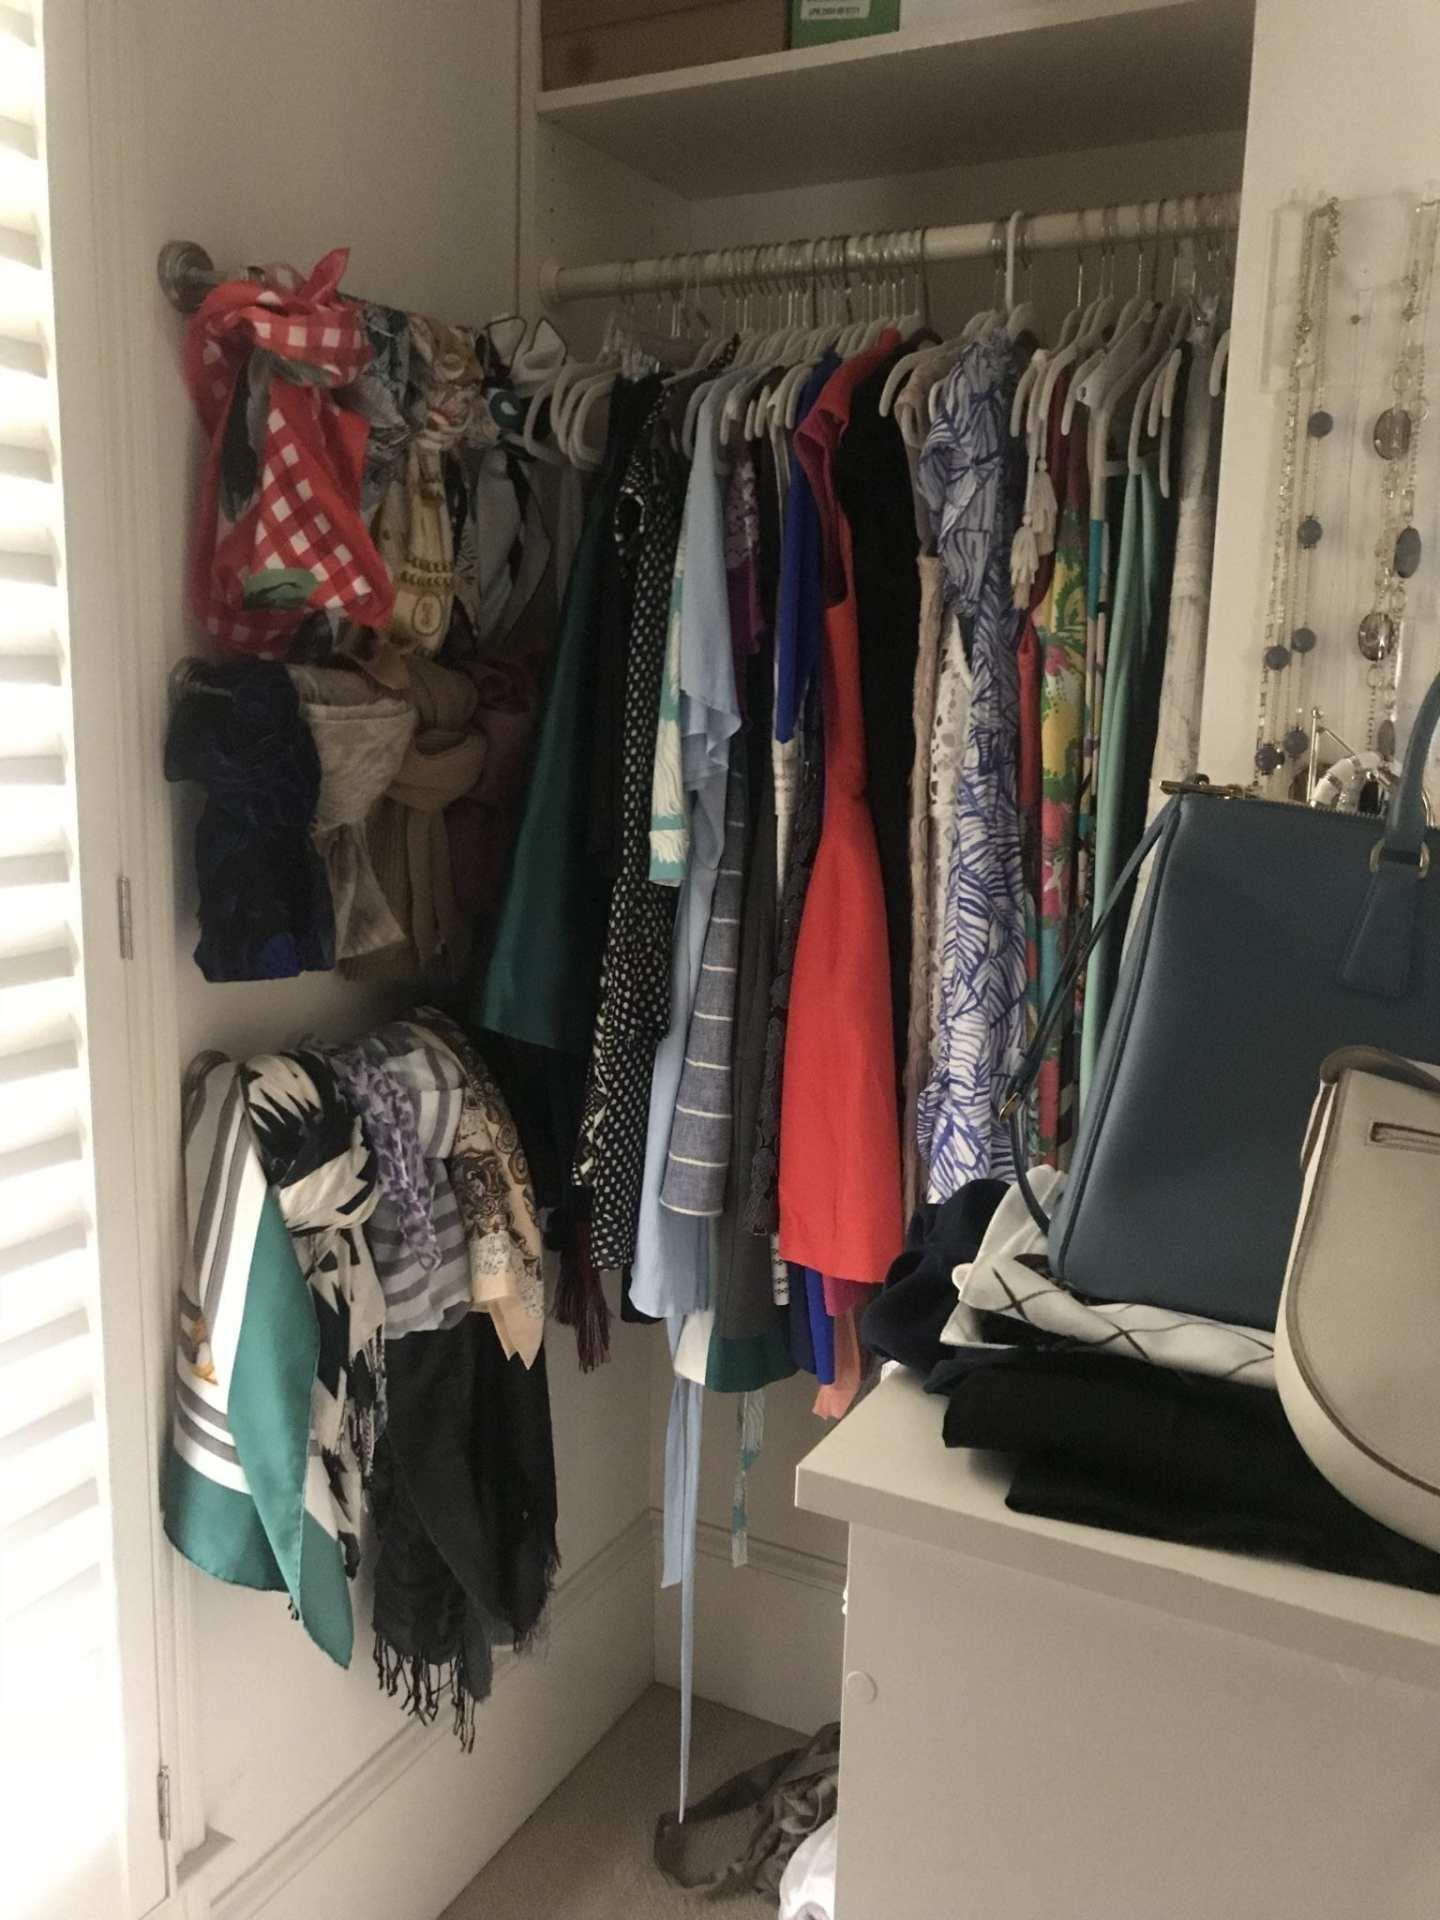 Organizing closet tips.